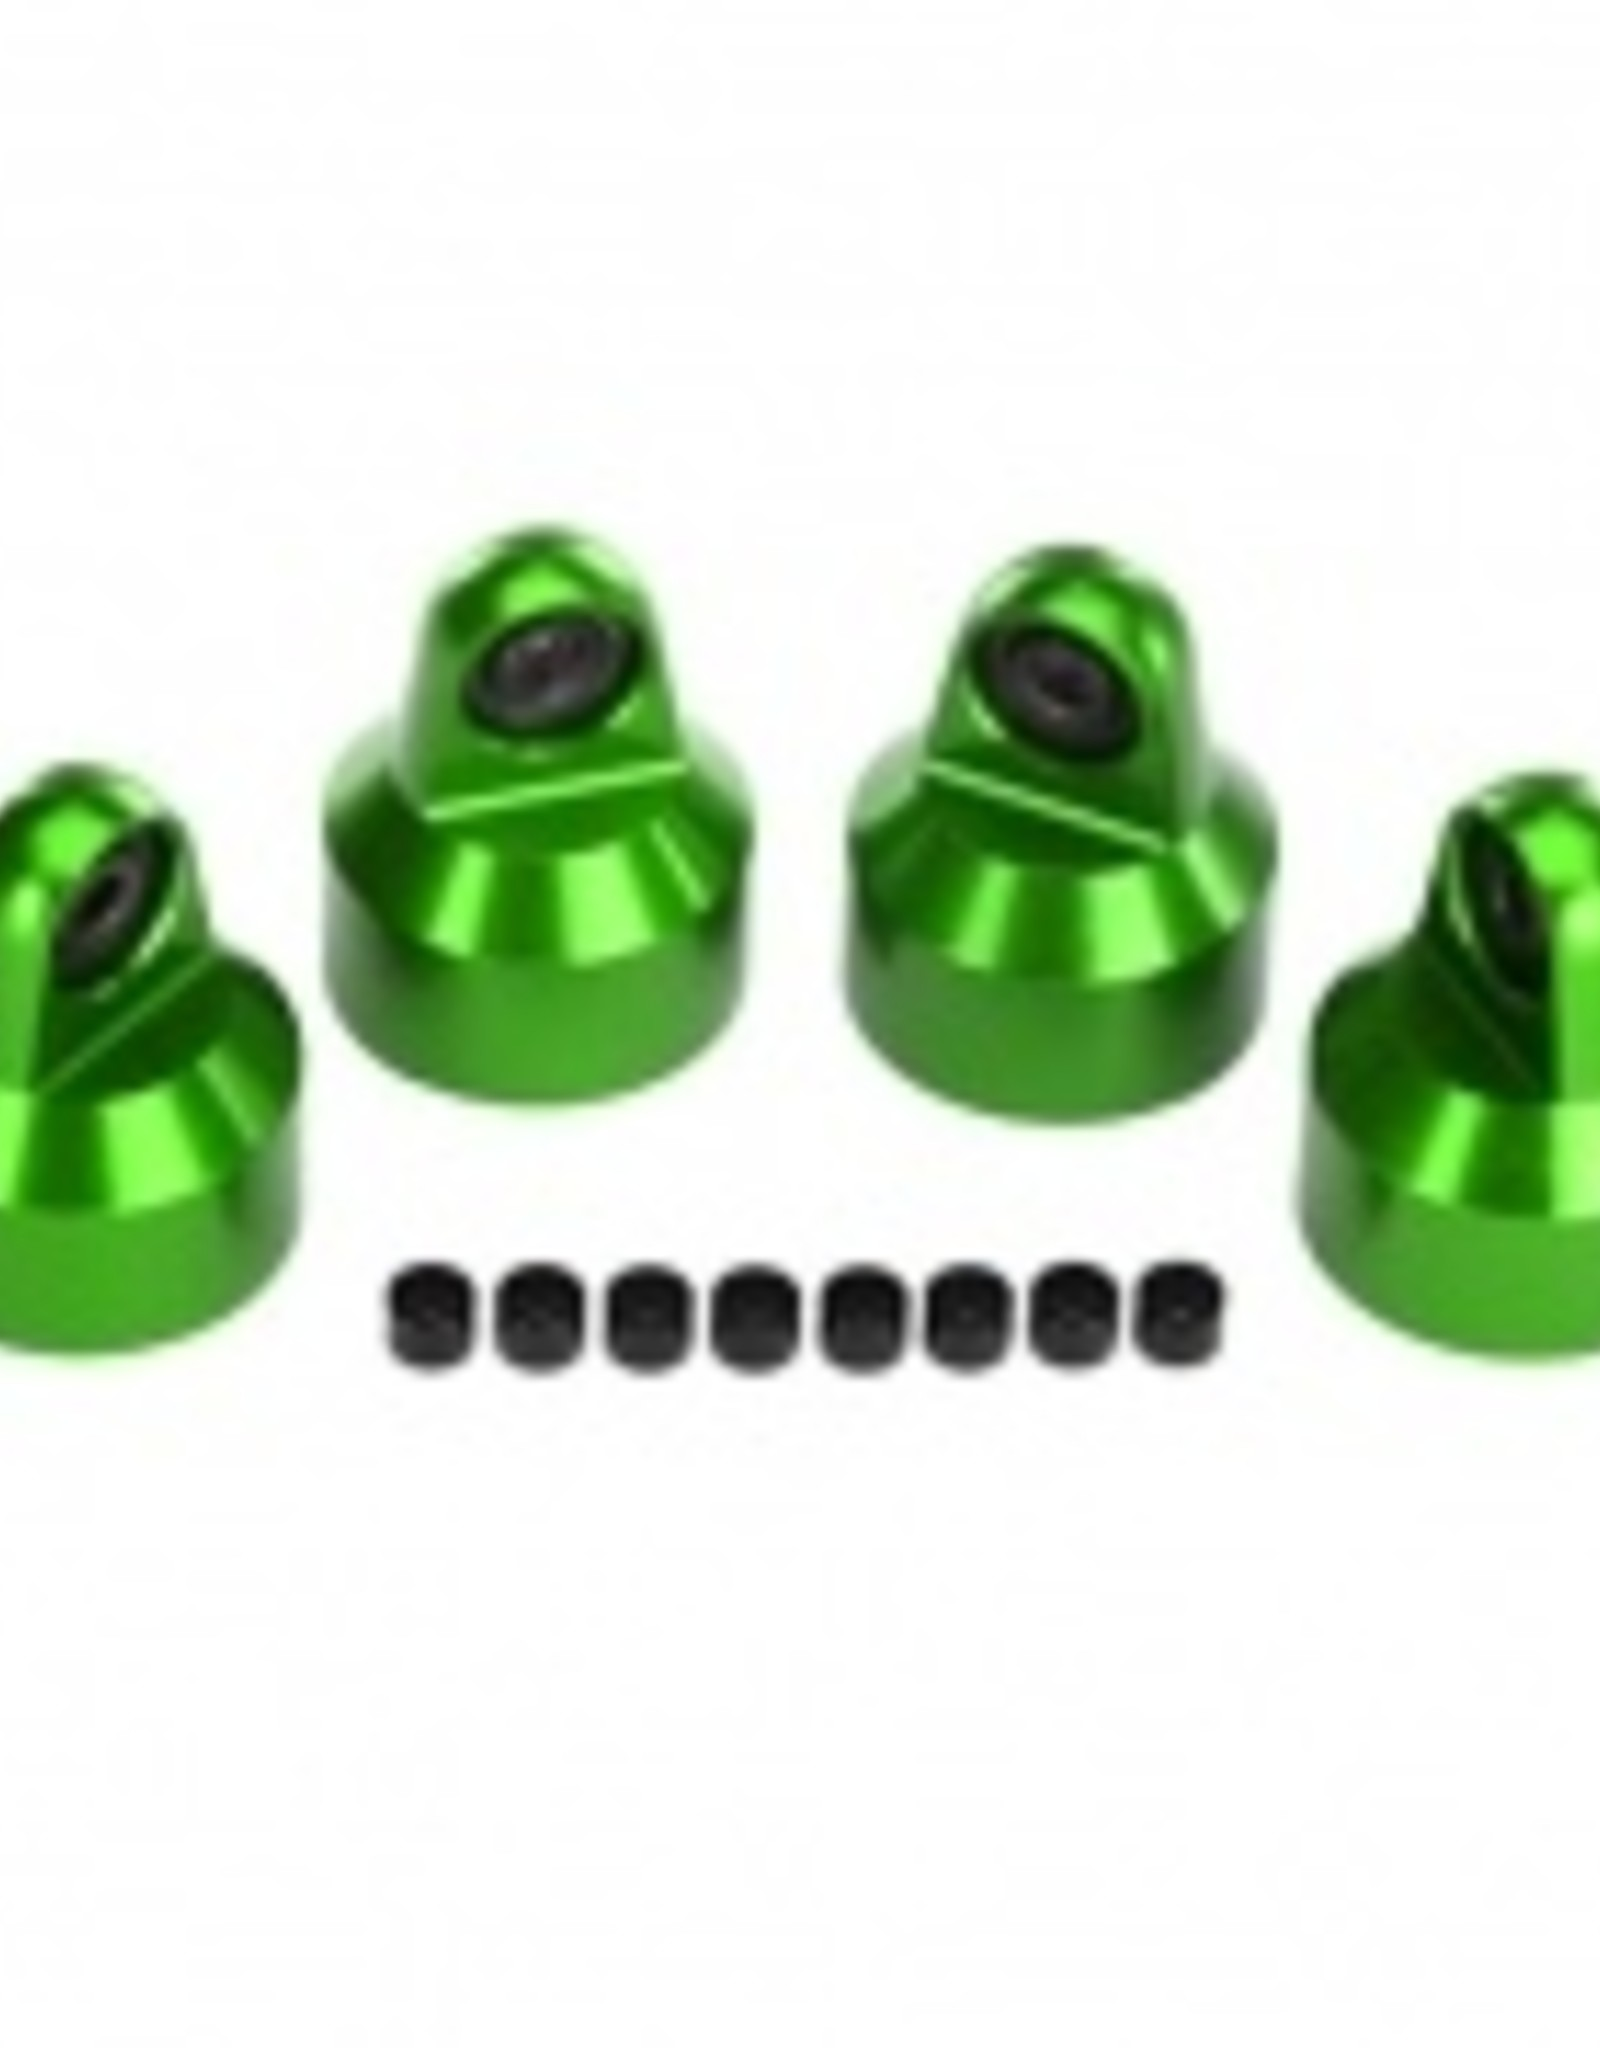 Traxxas Traxxas X-Maxx Shock caps, aluminum (green-anodized), GTX shocks (4)/ spacers (8)